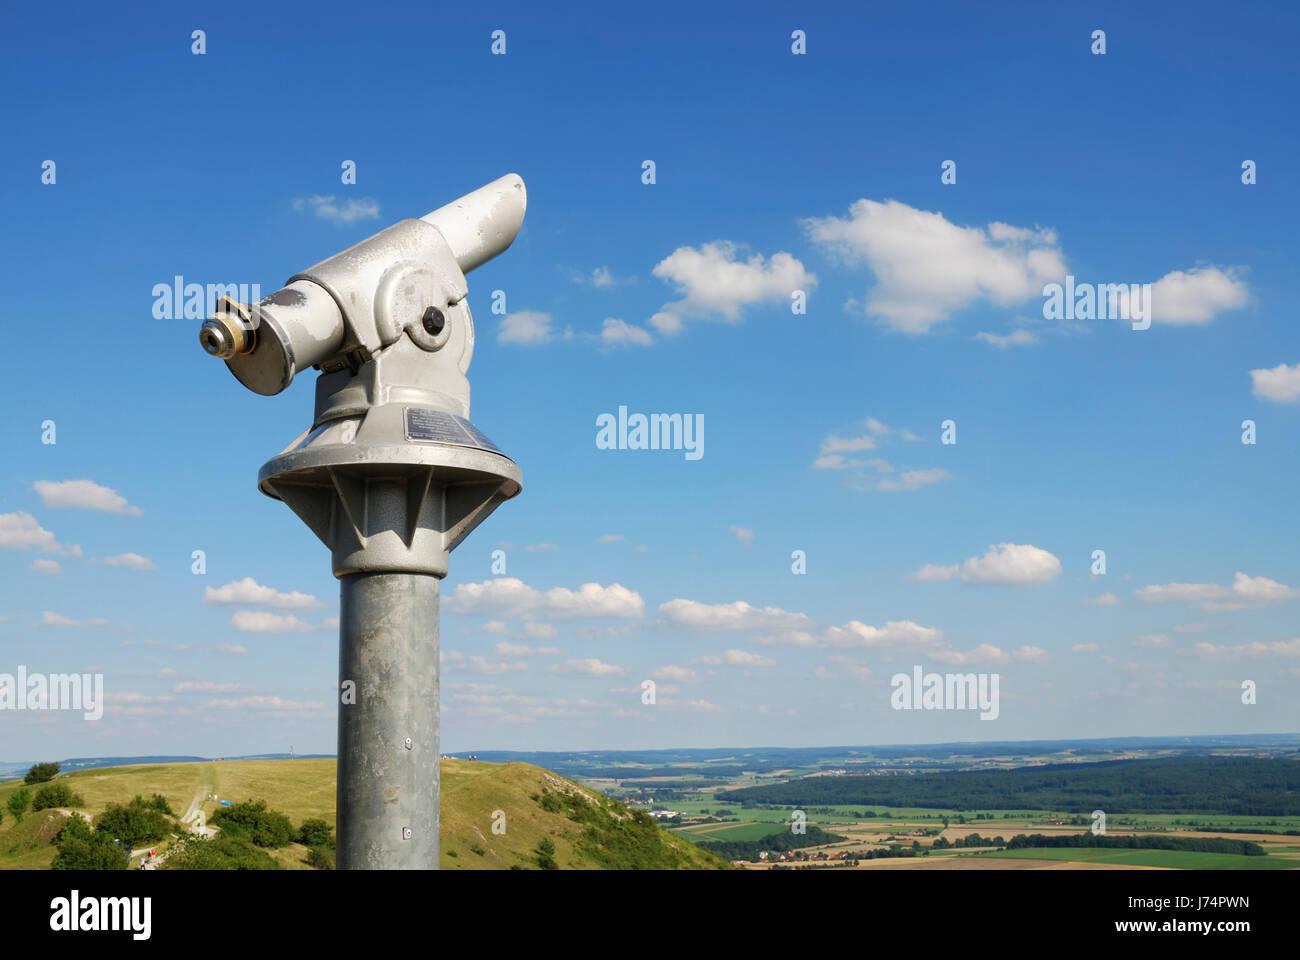 Sky watcher binokularansatz mit fach barlow linse teleskop